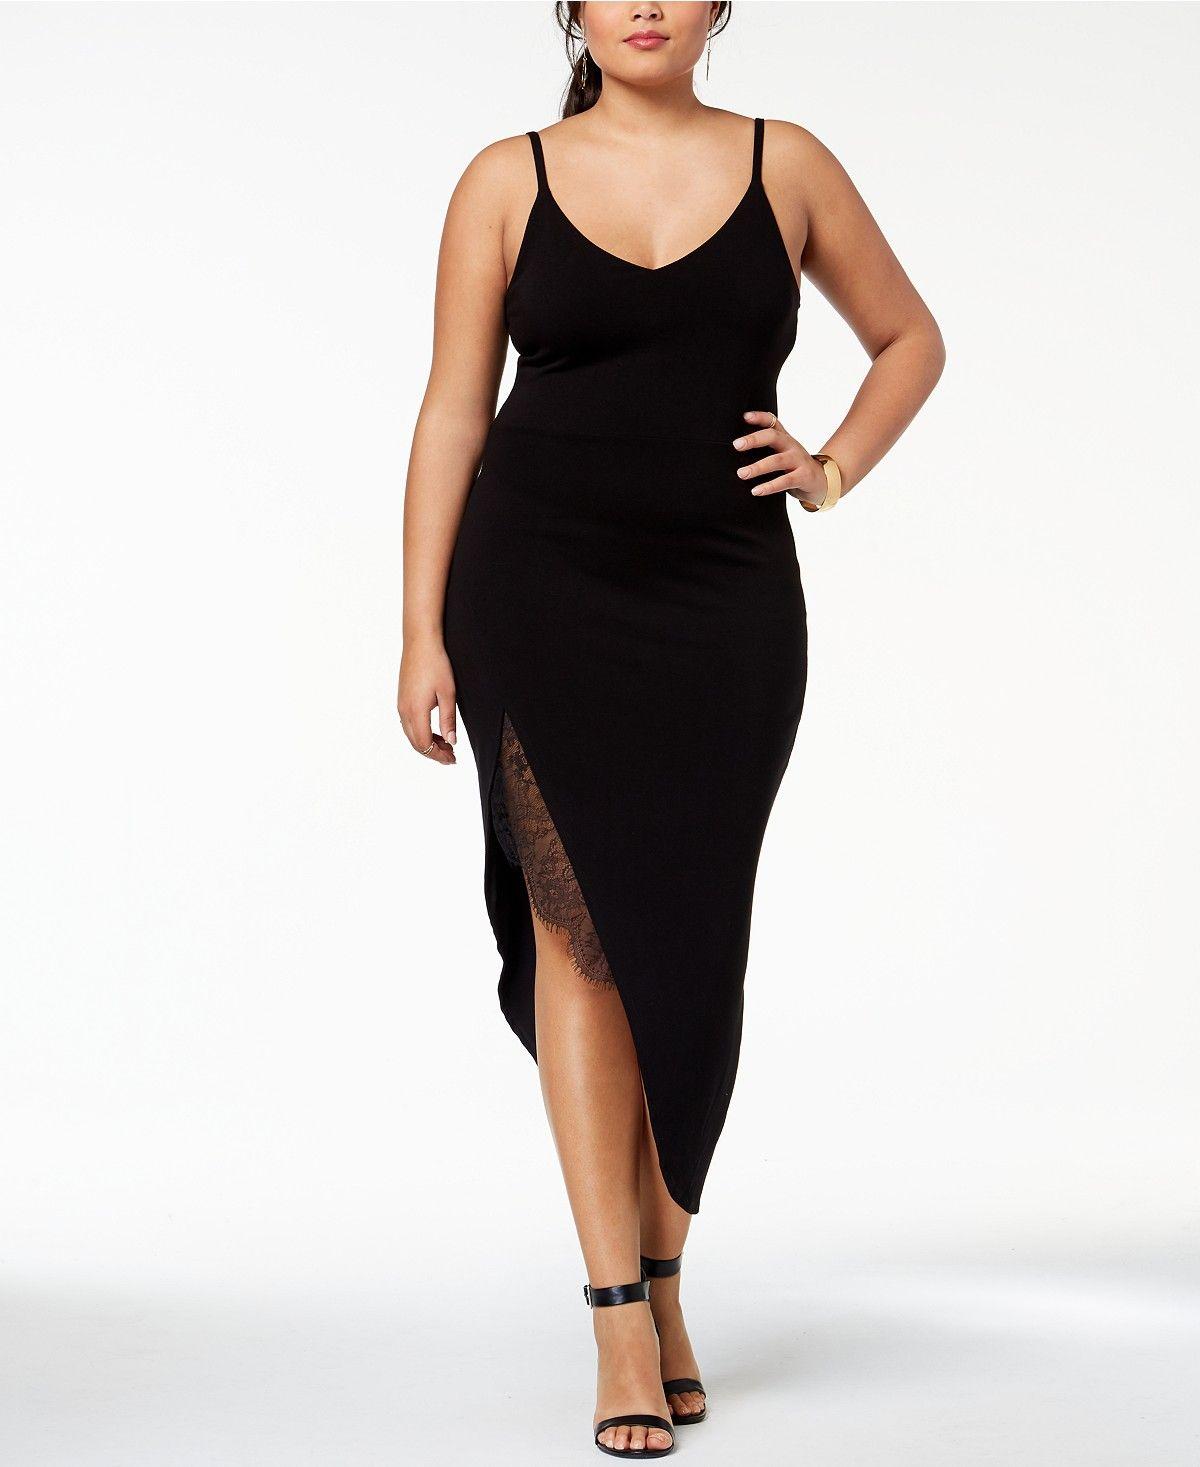 Soprano Trendy Plus Size Lace-Trim Slip Dress - Dresses ...